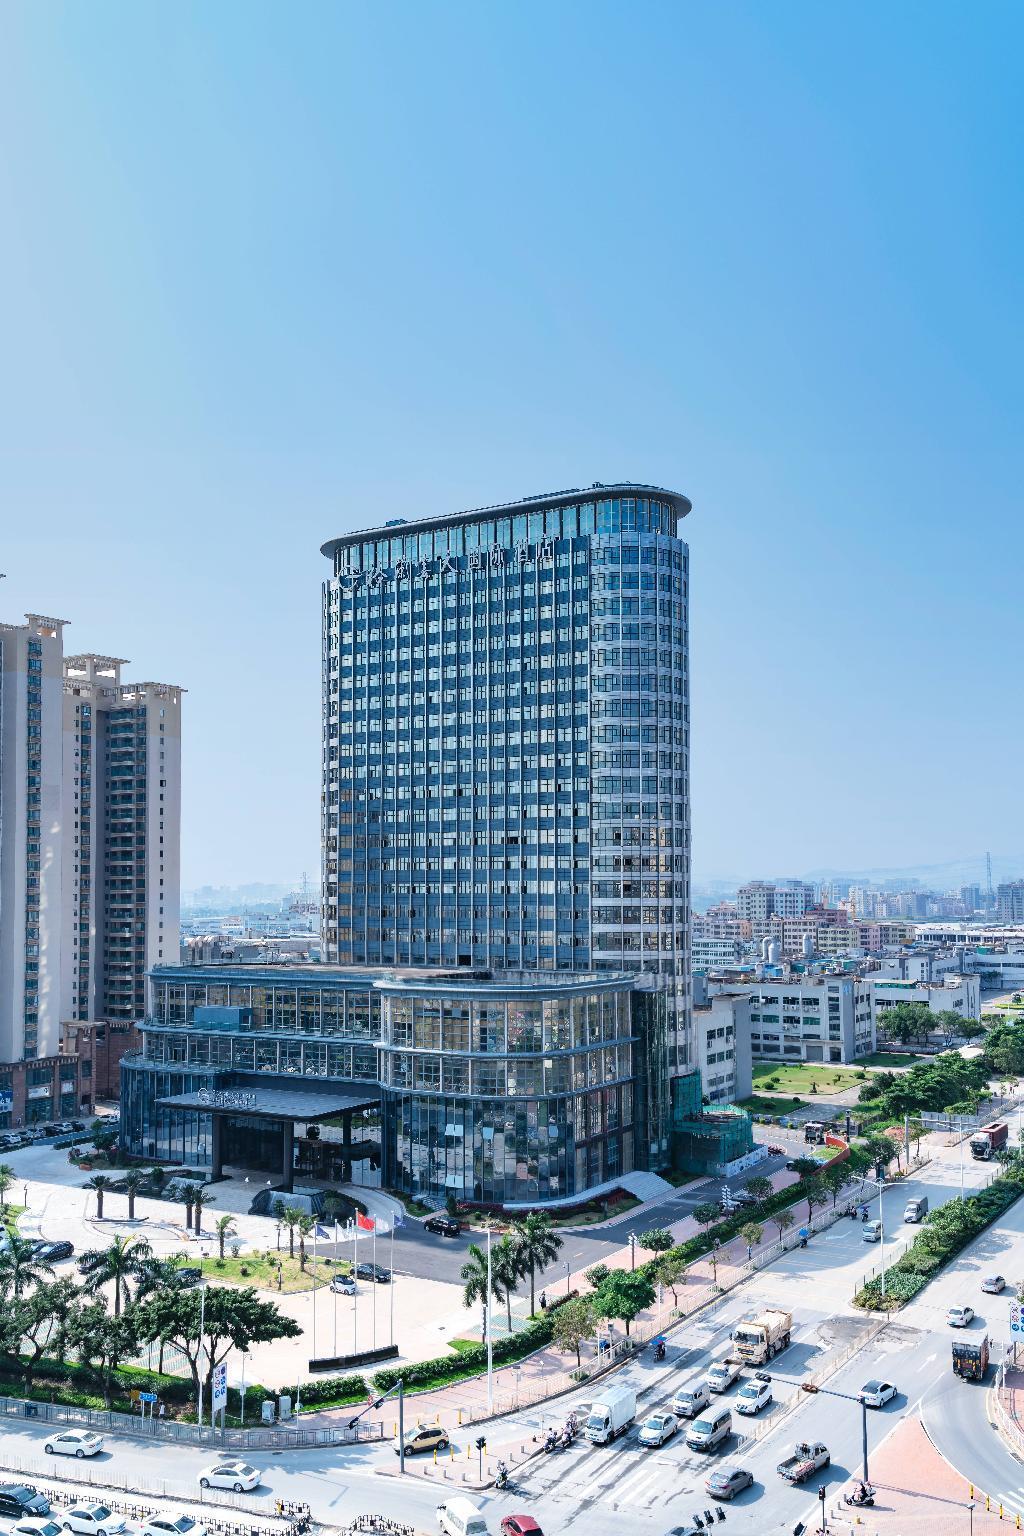 Grand Skylight International Hotel Blog Shenzhen New International Exhibition Center